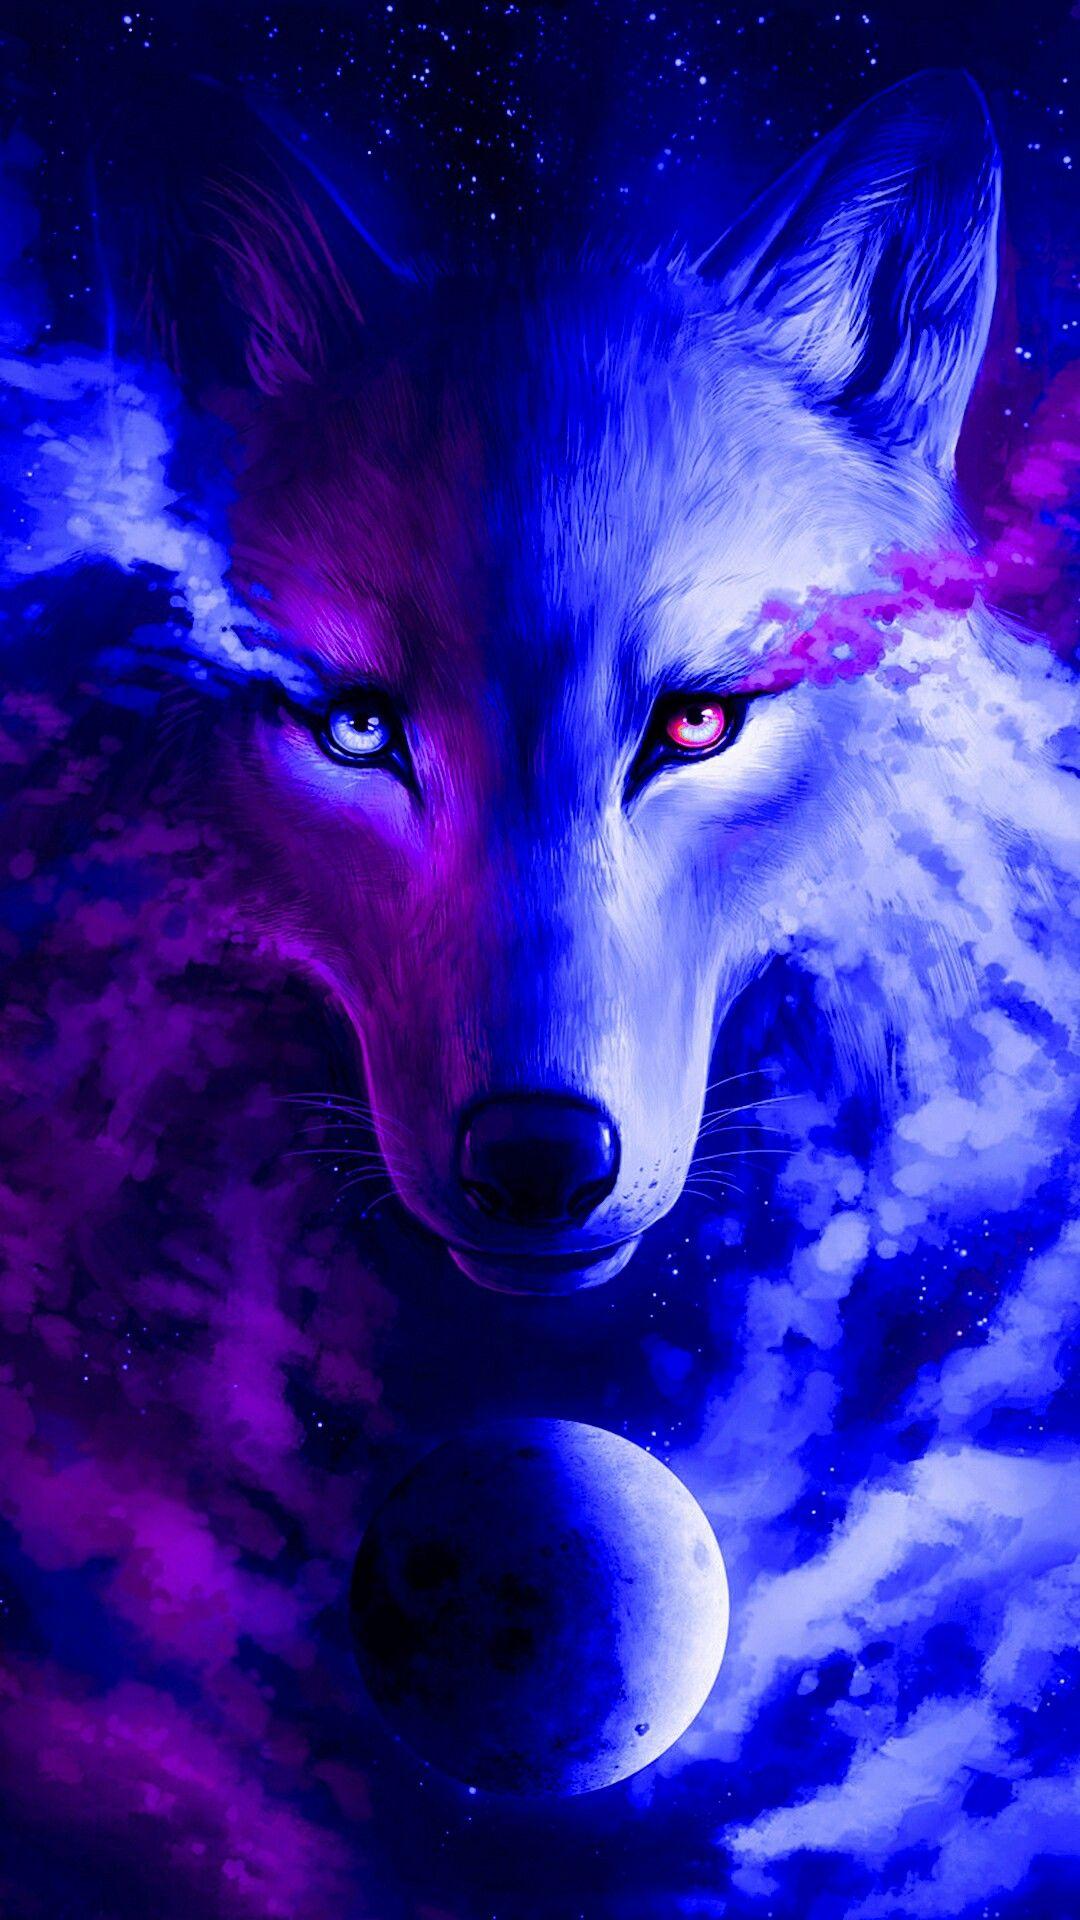 Pin de Bia Varela em wallpaper | Lobos, Fondos de pantalla animales e Fondos animales